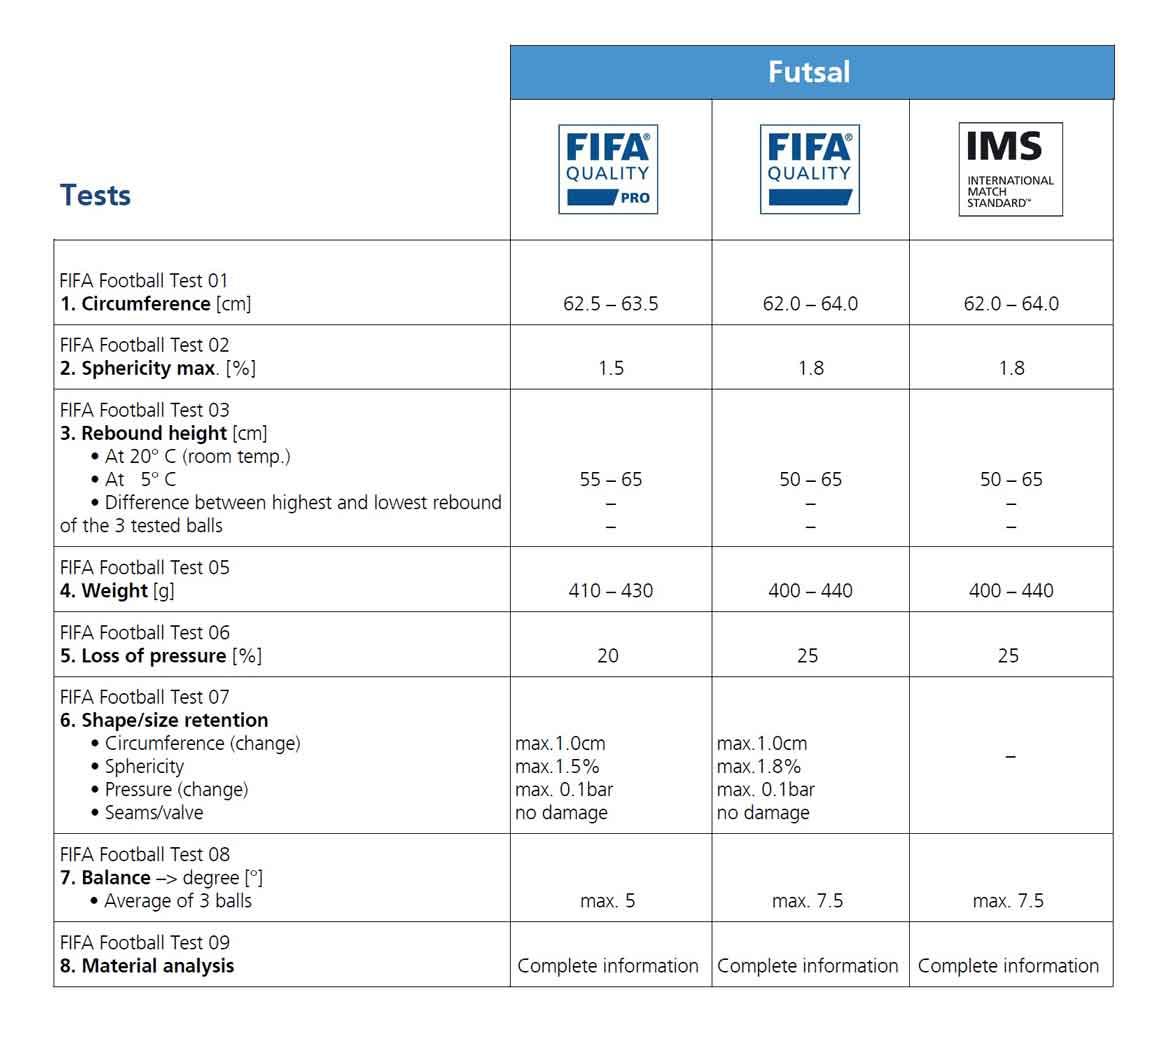 таблица показателей для мяча fifa quality pro